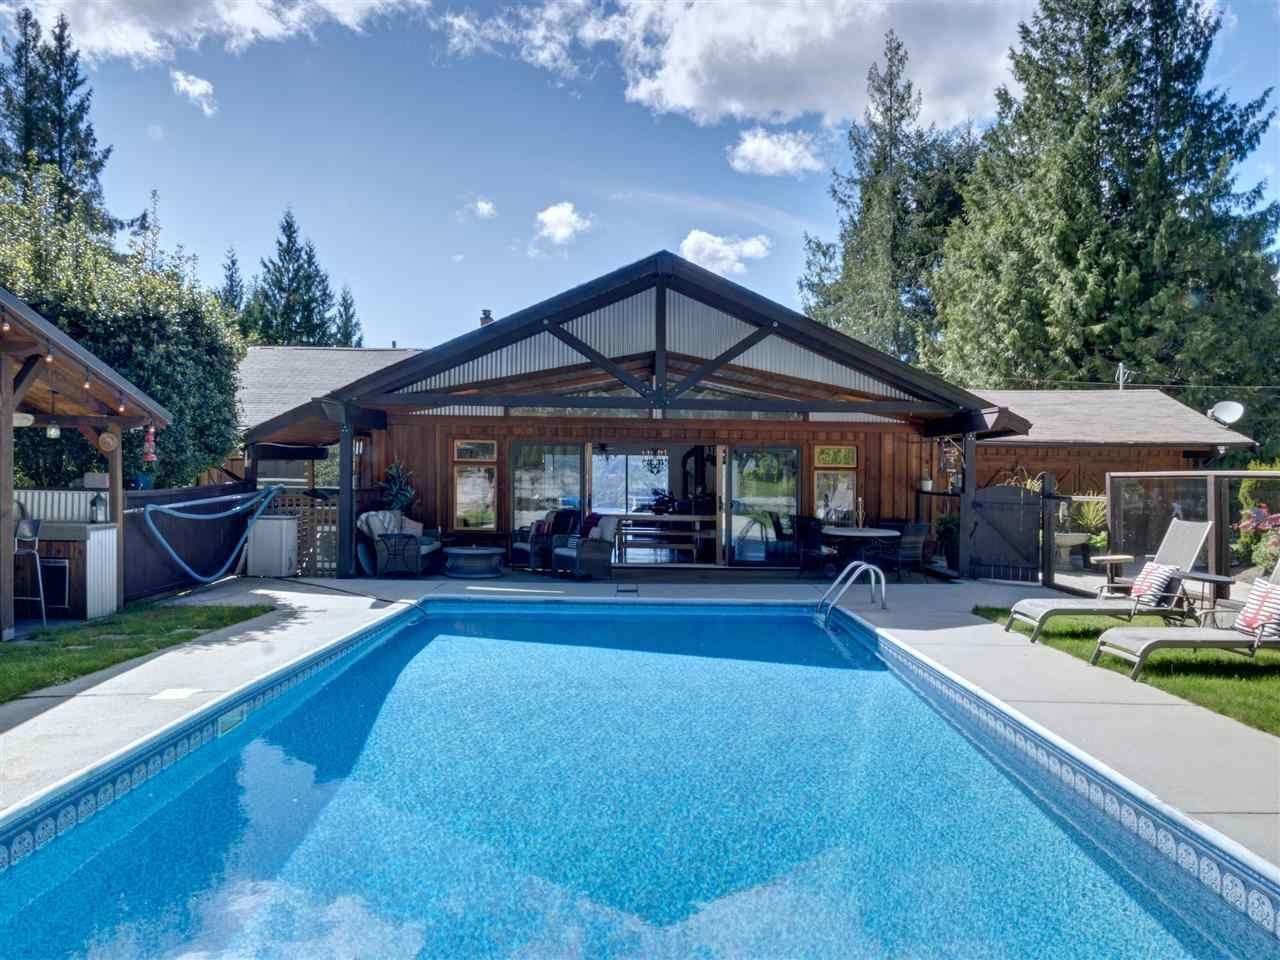 Main Photo: 7117 SECHELT INLET Road in Sechelt: Sechelt District House for sale (Sunshine Coast)  : MLS®# R2578615